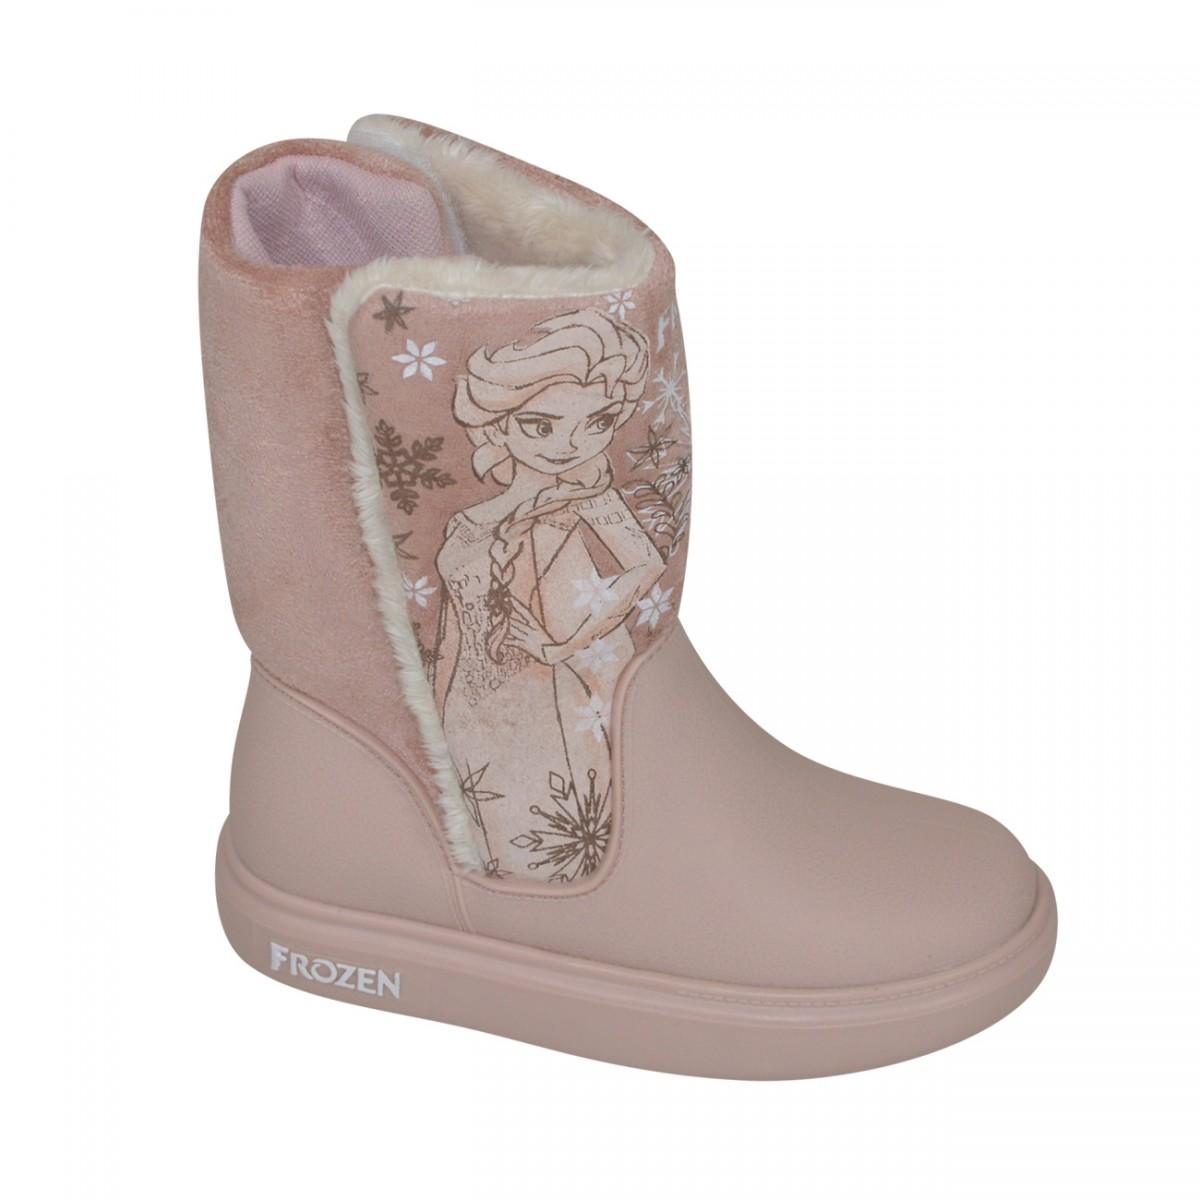 5089cccdbc8 Bota Frozen Snowland 21565 Infantil 21565 - 01276 - Rosa - Chuteira Nike